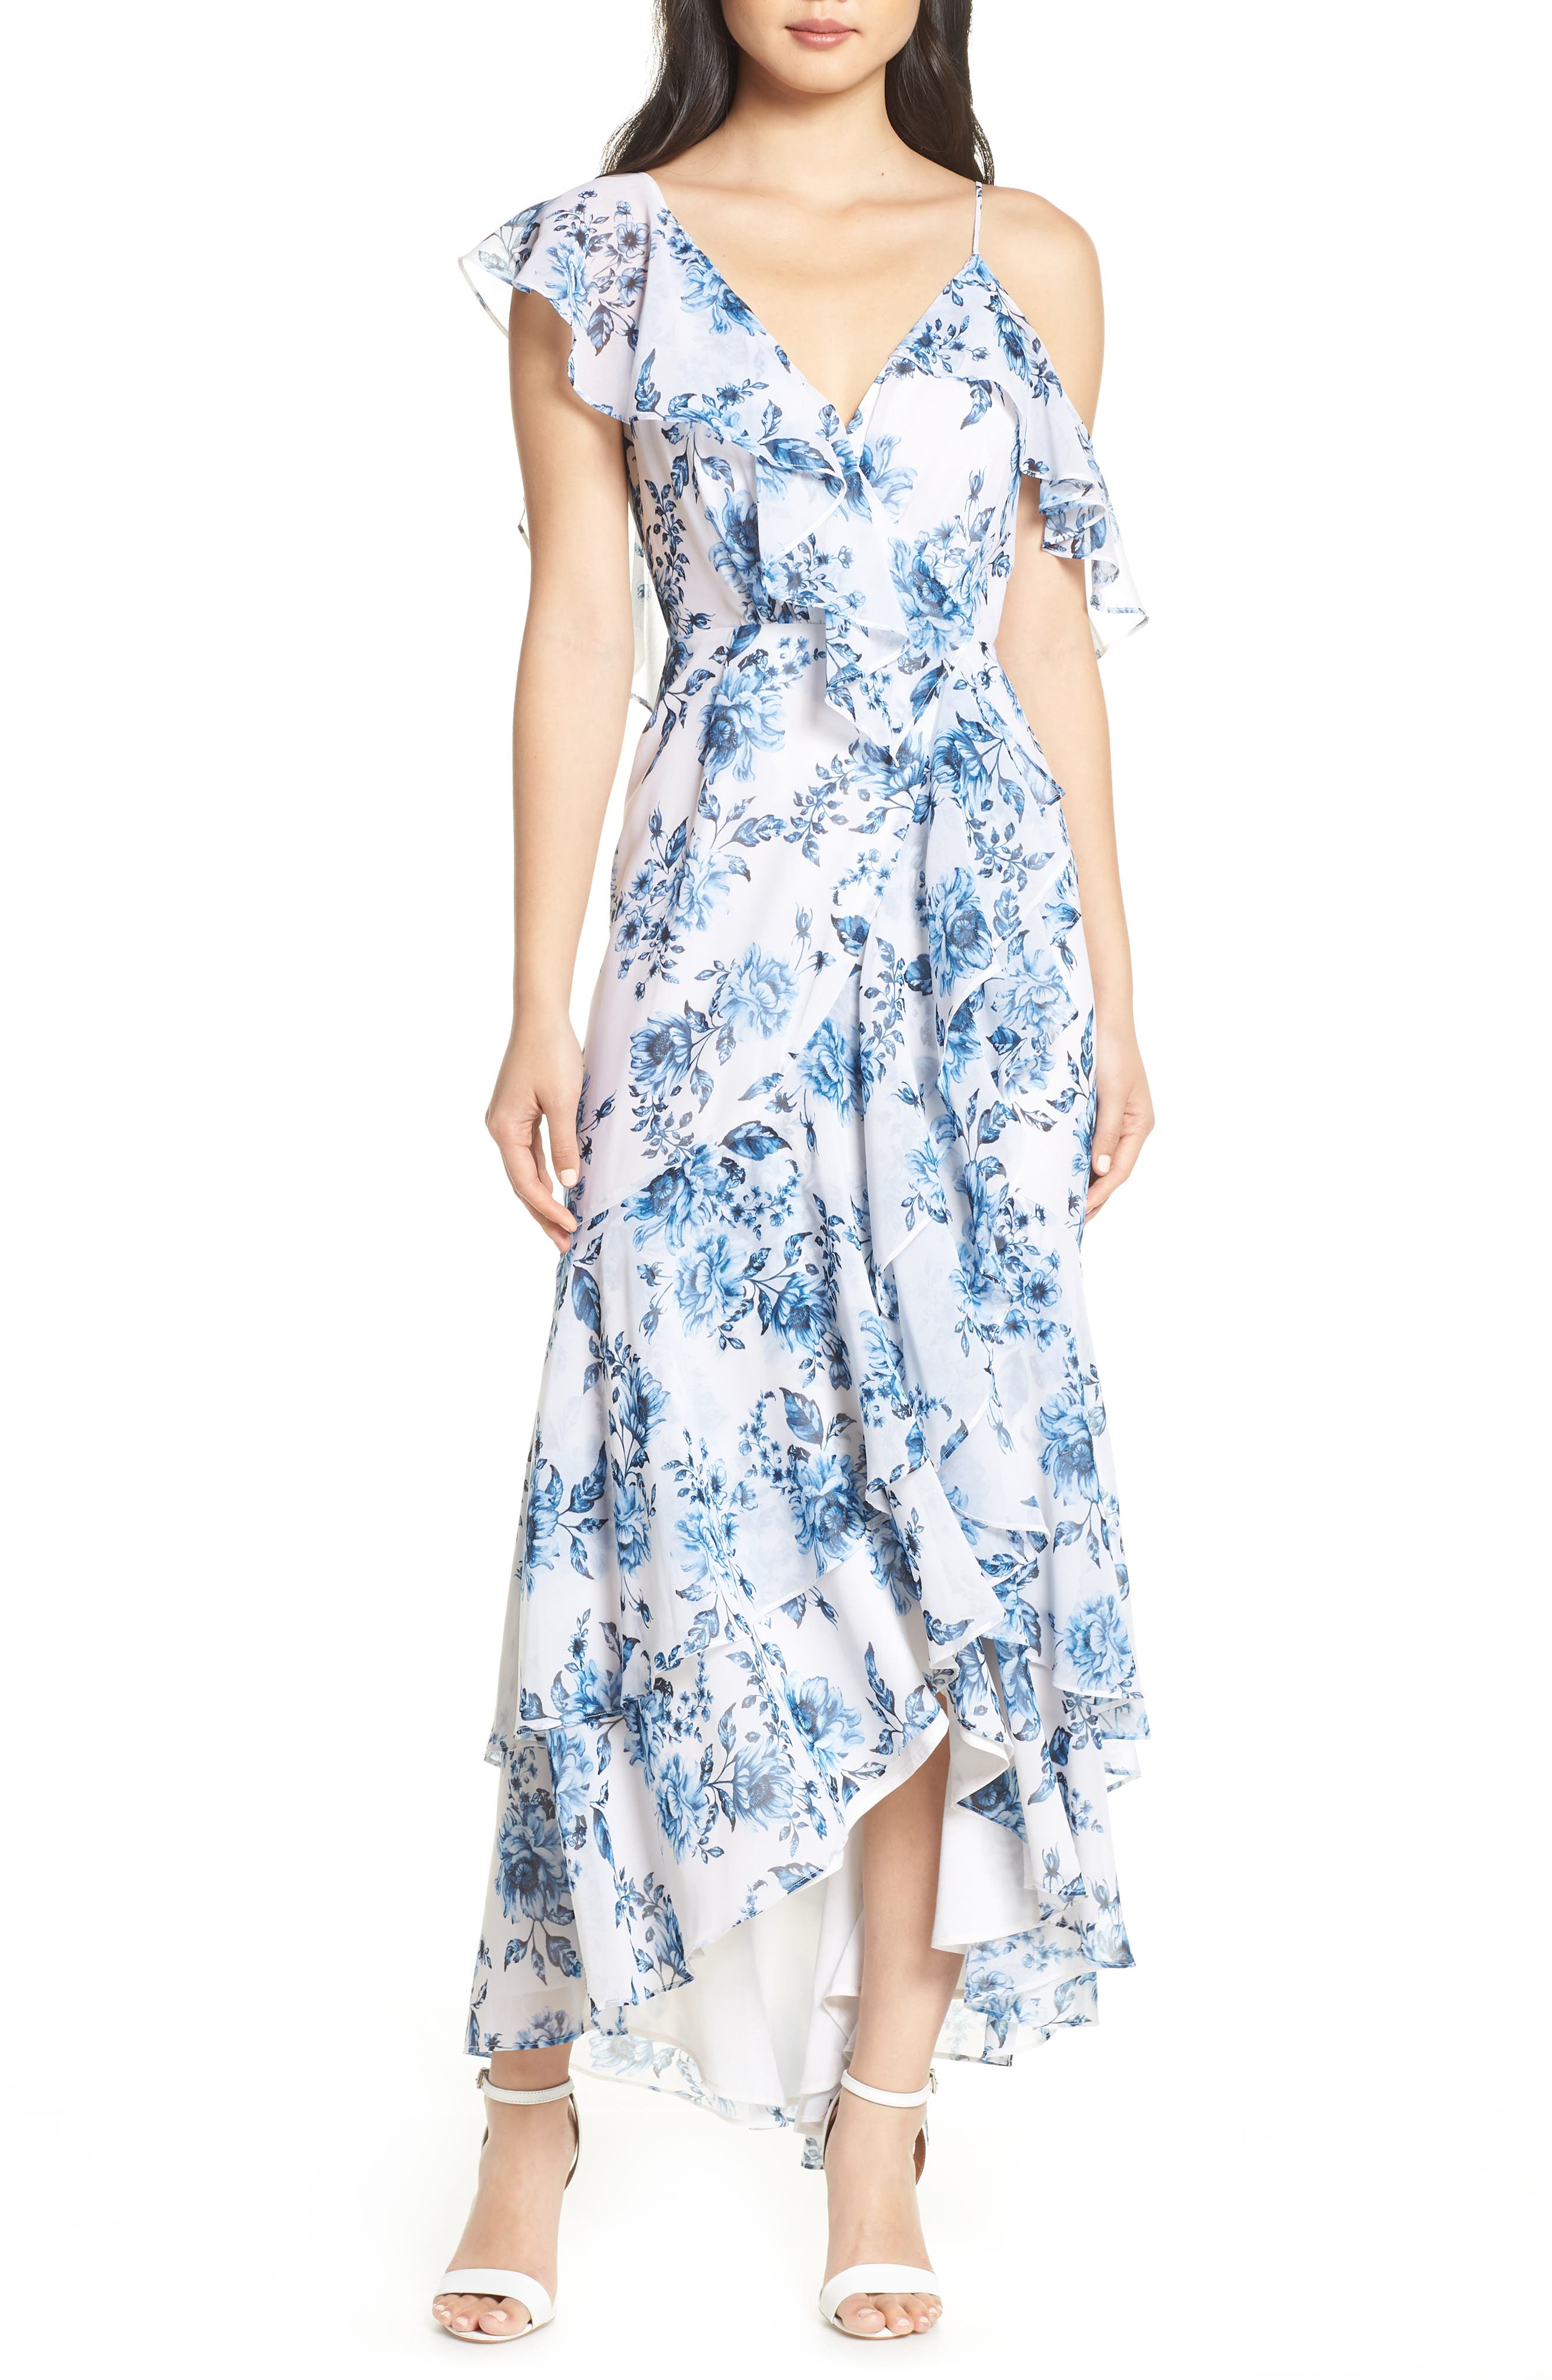 Elanor Ruffle Faux Wrap Maxi Dress,                         Main,                         color, BLUE TOILE FLORAL